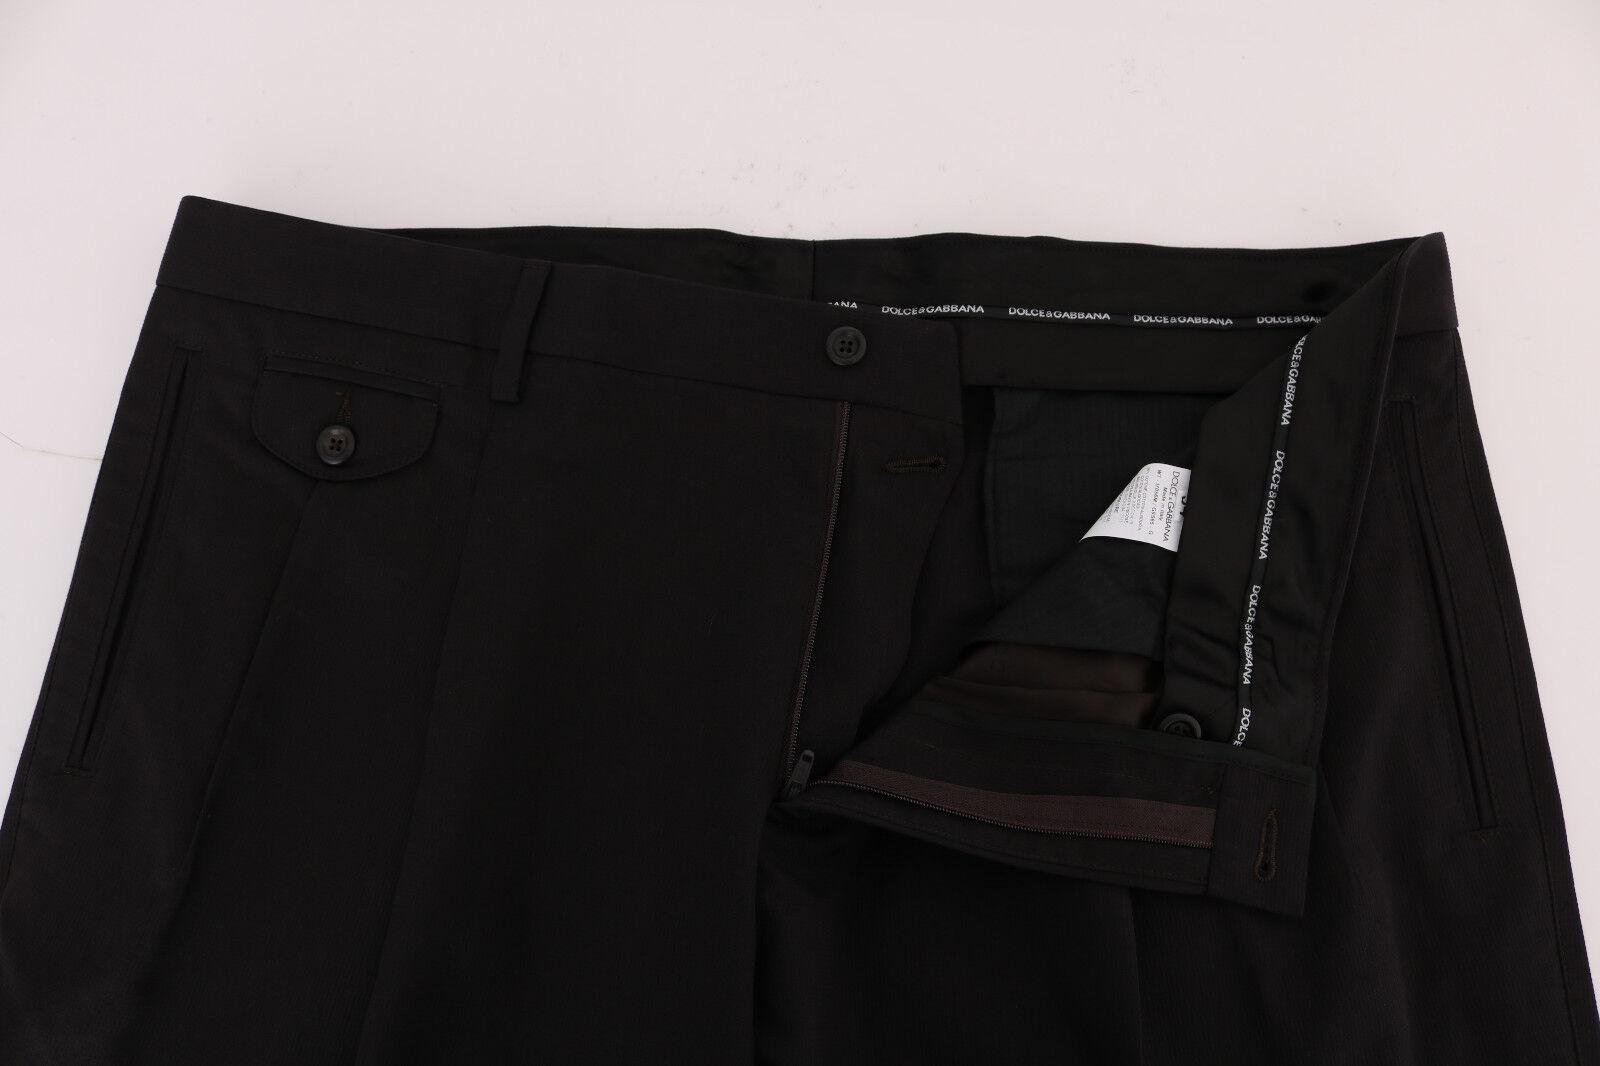 Neuf Dolce & Gabbana Pantalon Pantalon Gabbana Marron Robe Rayée Habillé S.It56 / W42 6e88f8